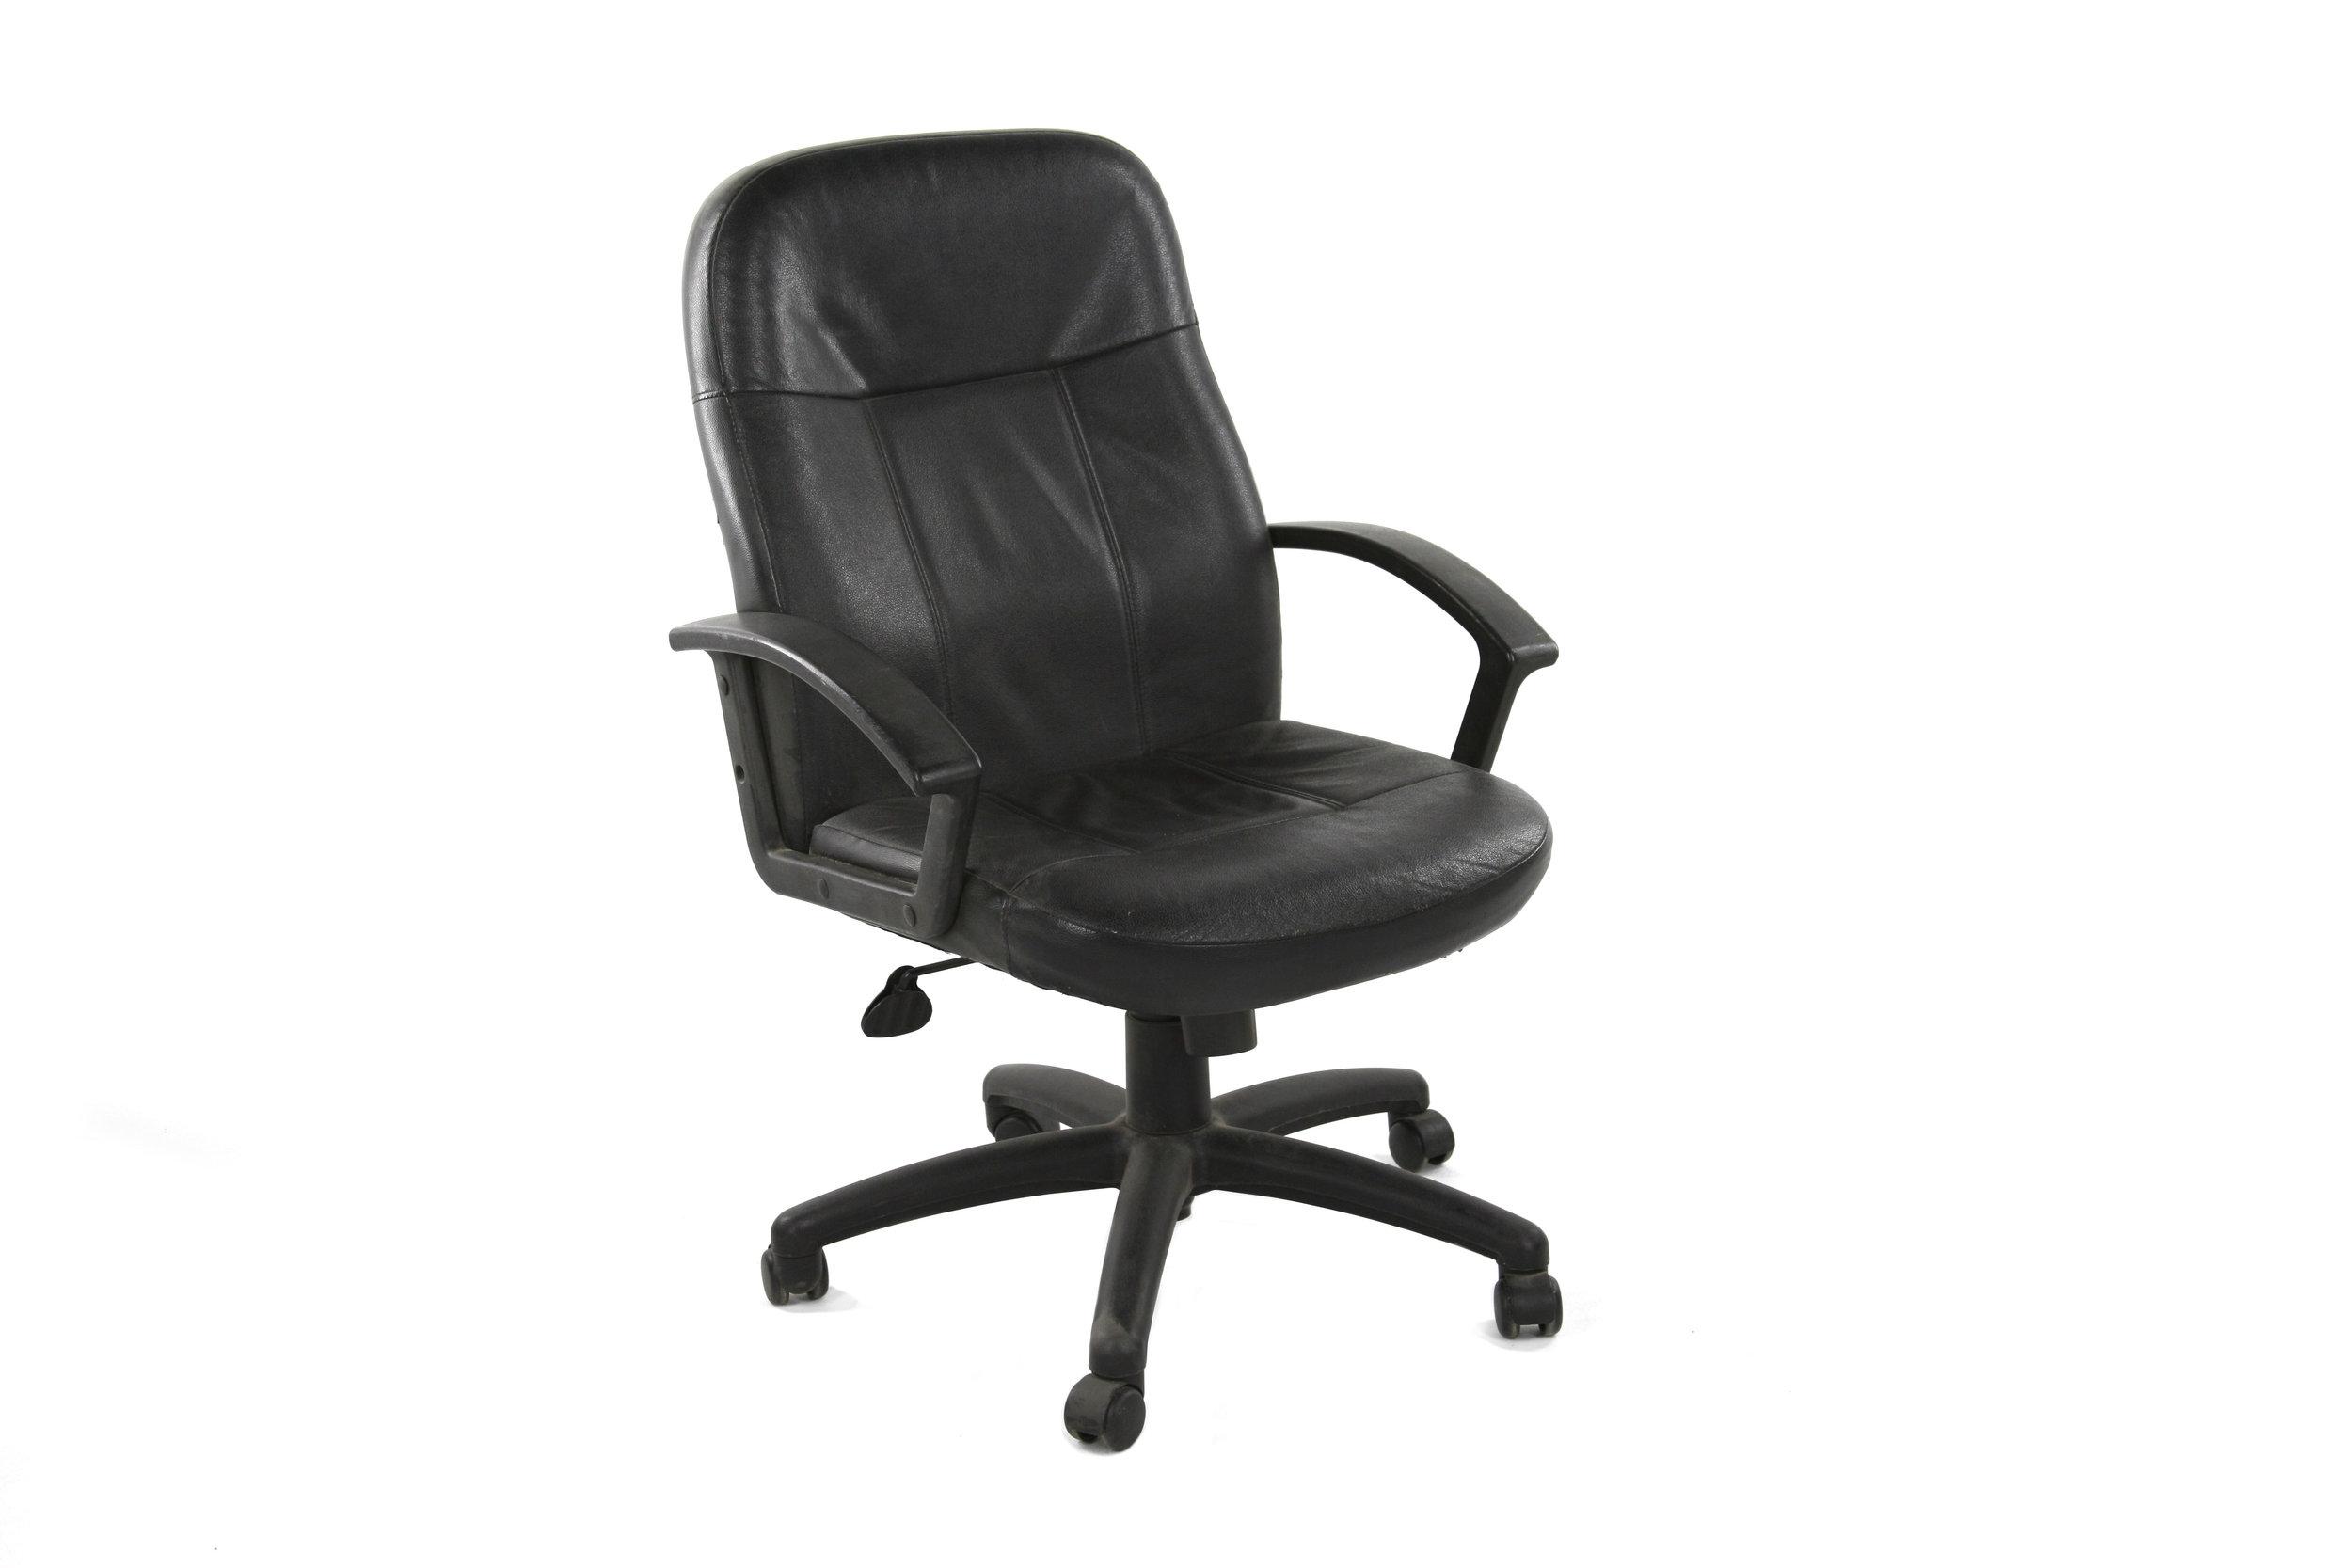 Black Rolling Office Chair 2.jpg